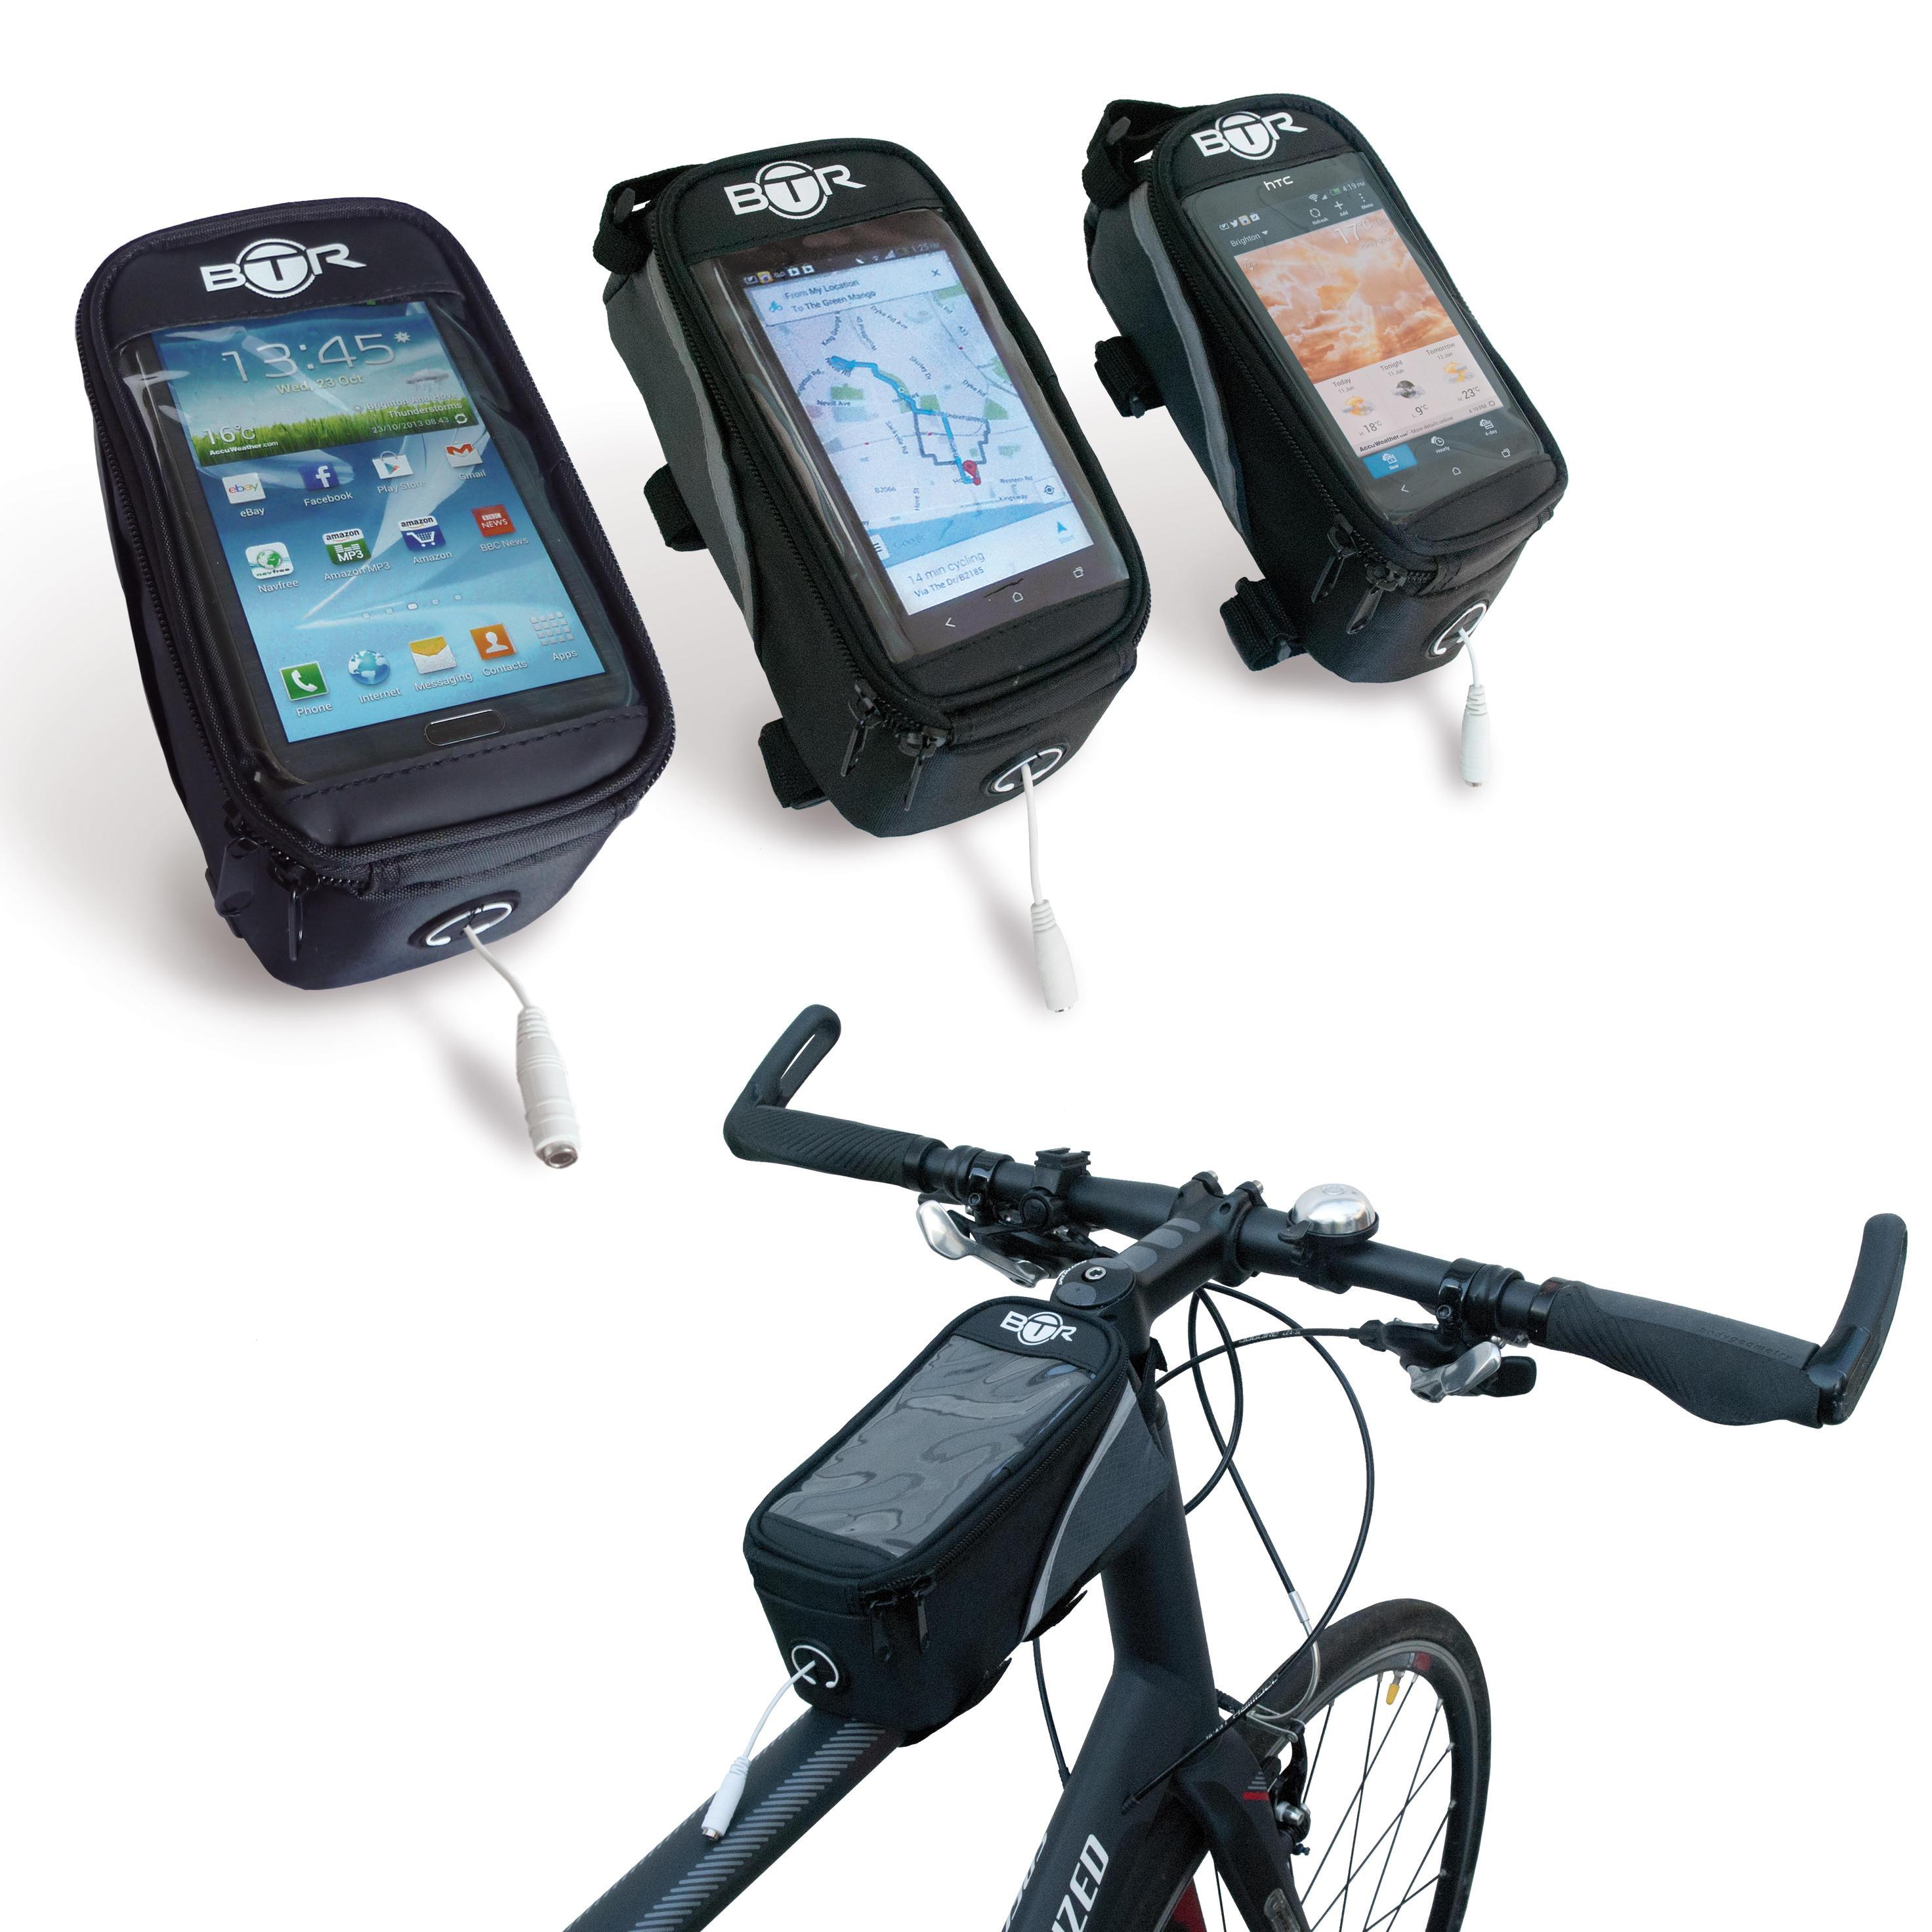 Btr Water Resistant Frame Bike Bag And Mobile Phone Holder